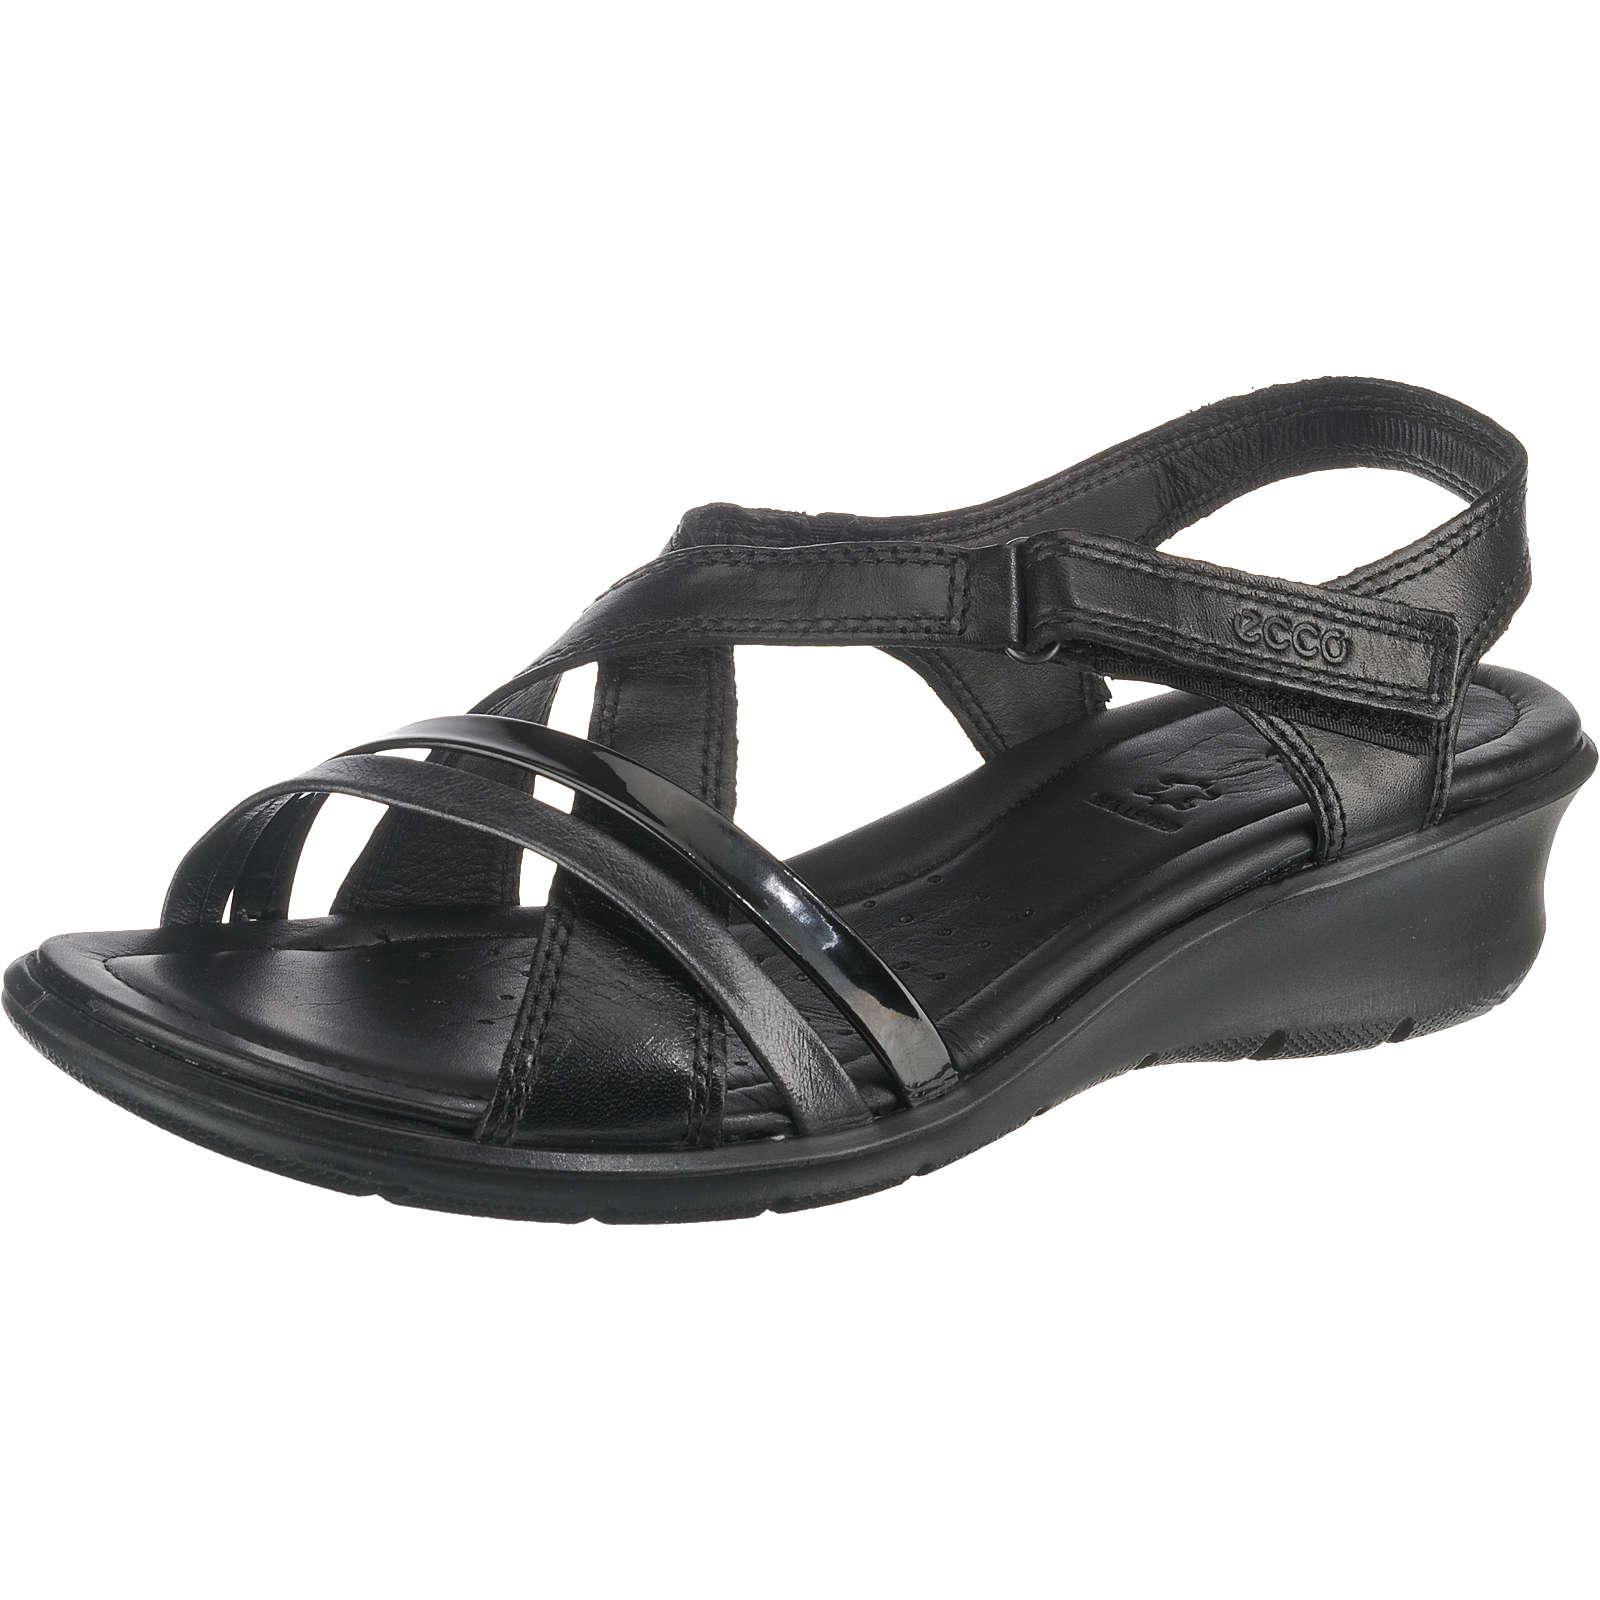 ECCO FELICIA SANDAL Klassische Sandaletten schwarz Damen Gr. 36